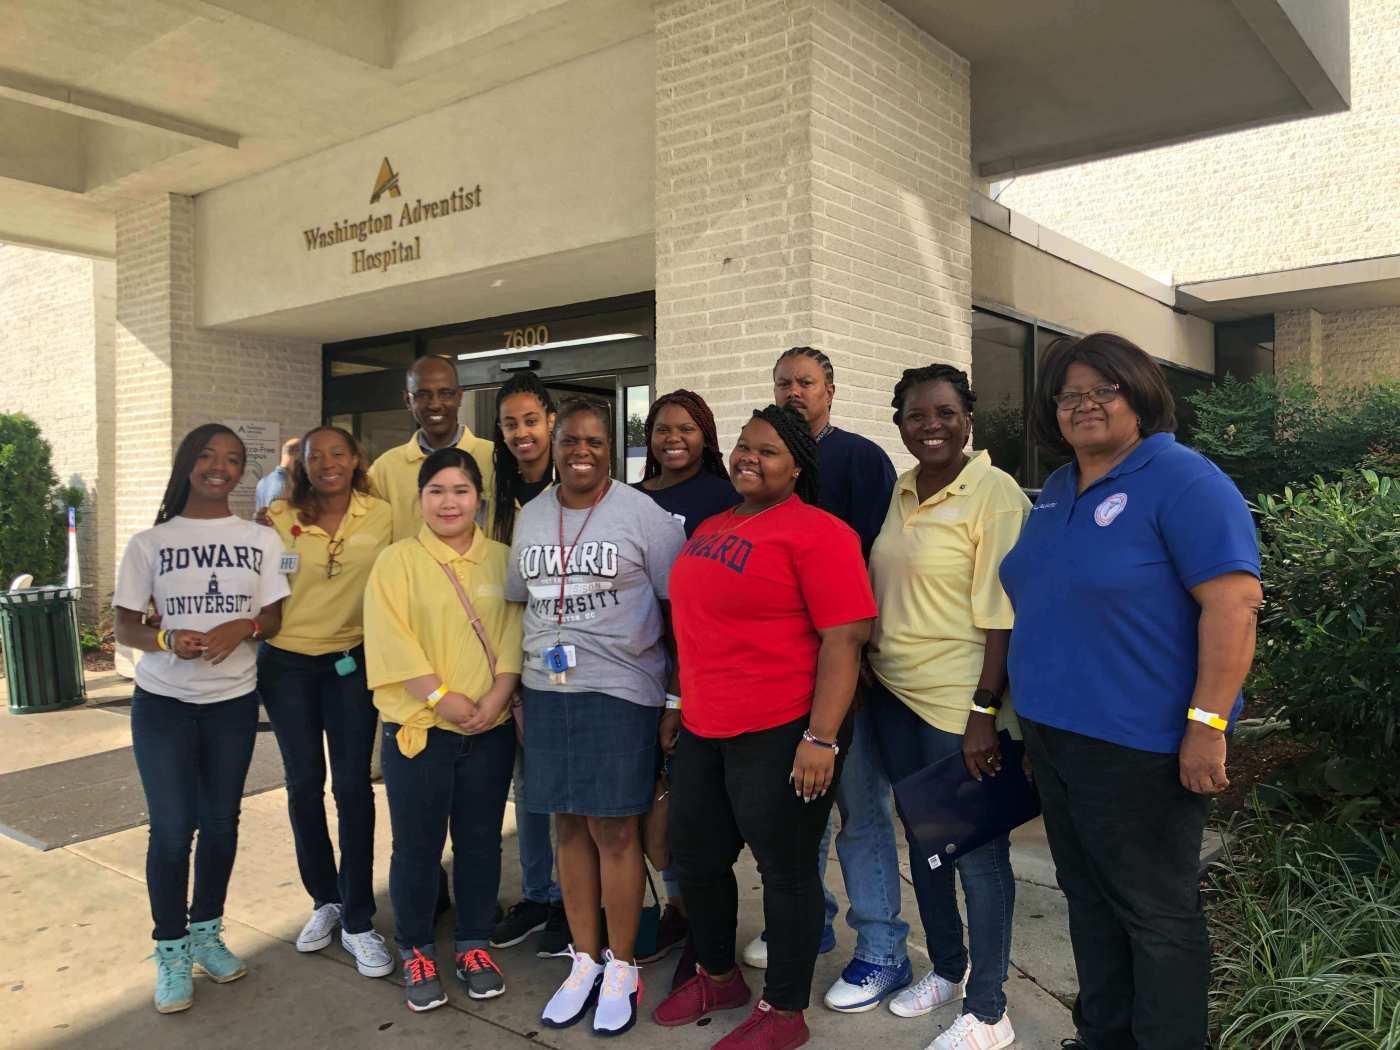 Howard University Staff and Students at Washington Adventist HealthCare in Takoma Park Maryland